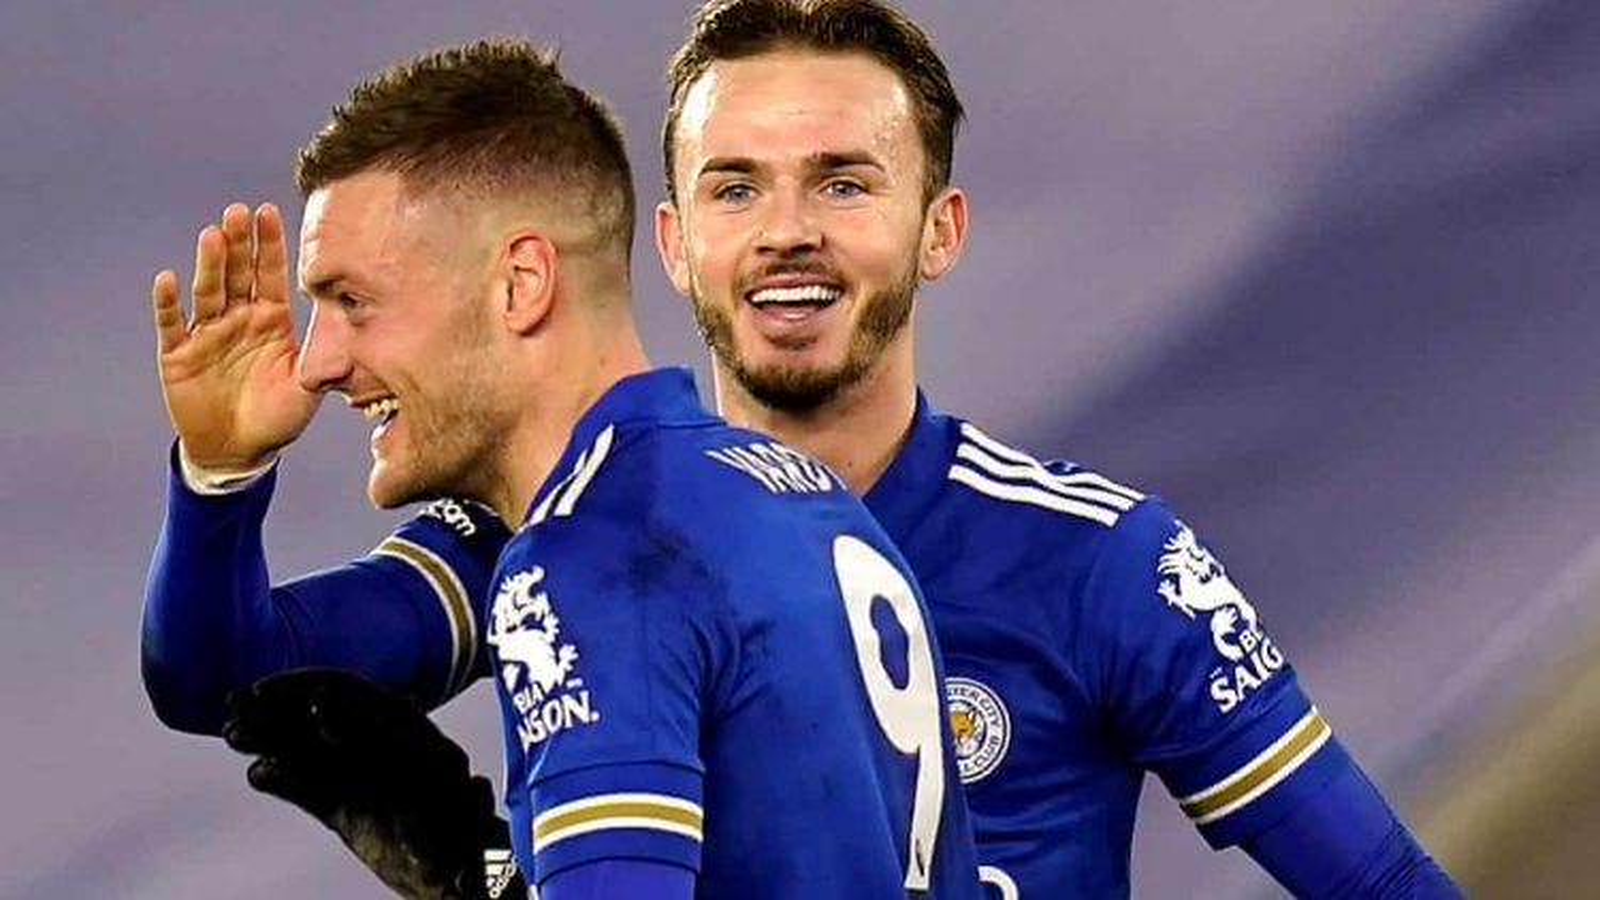 Thắng thuyết phục Chelsea, Leicester tạm chiếm ngôi đầu Premier League